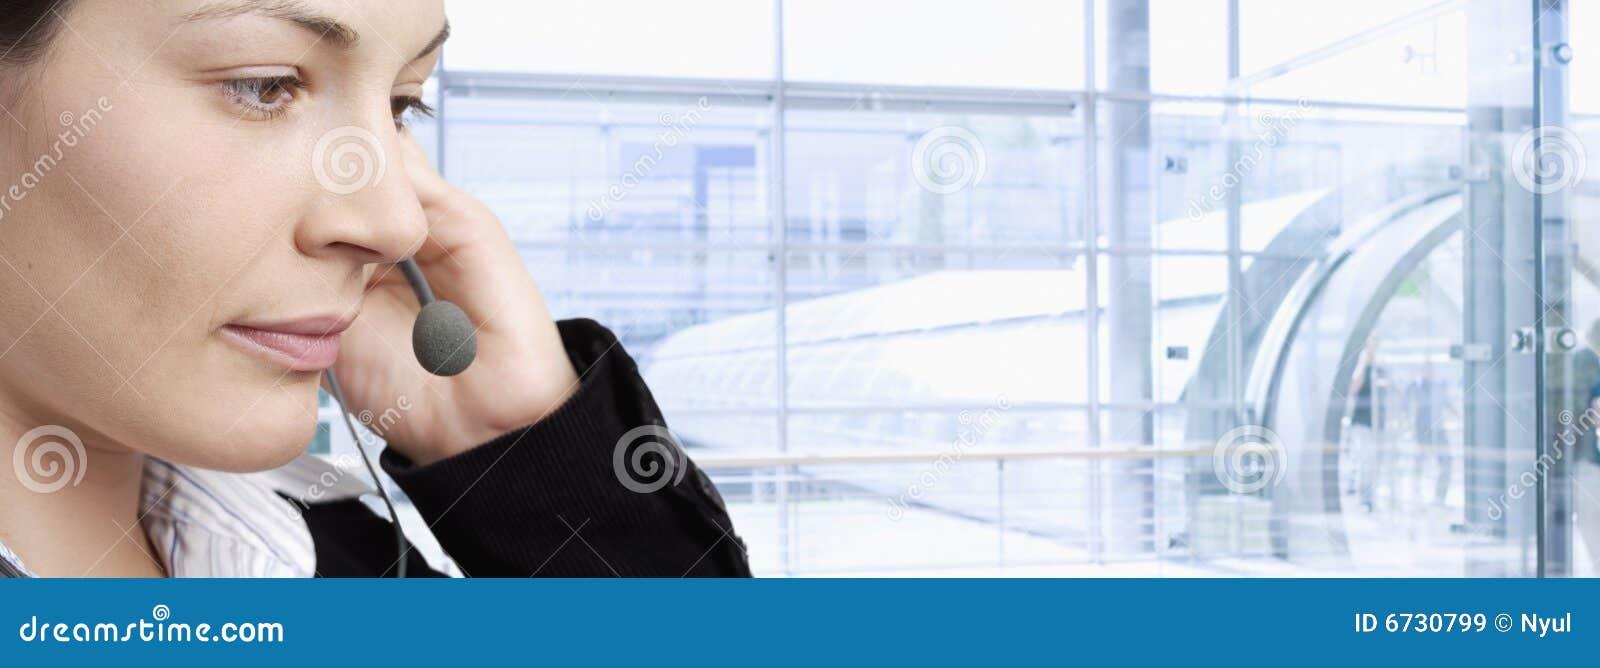 Happy Customer Service Representative Royalty Free Stock Images